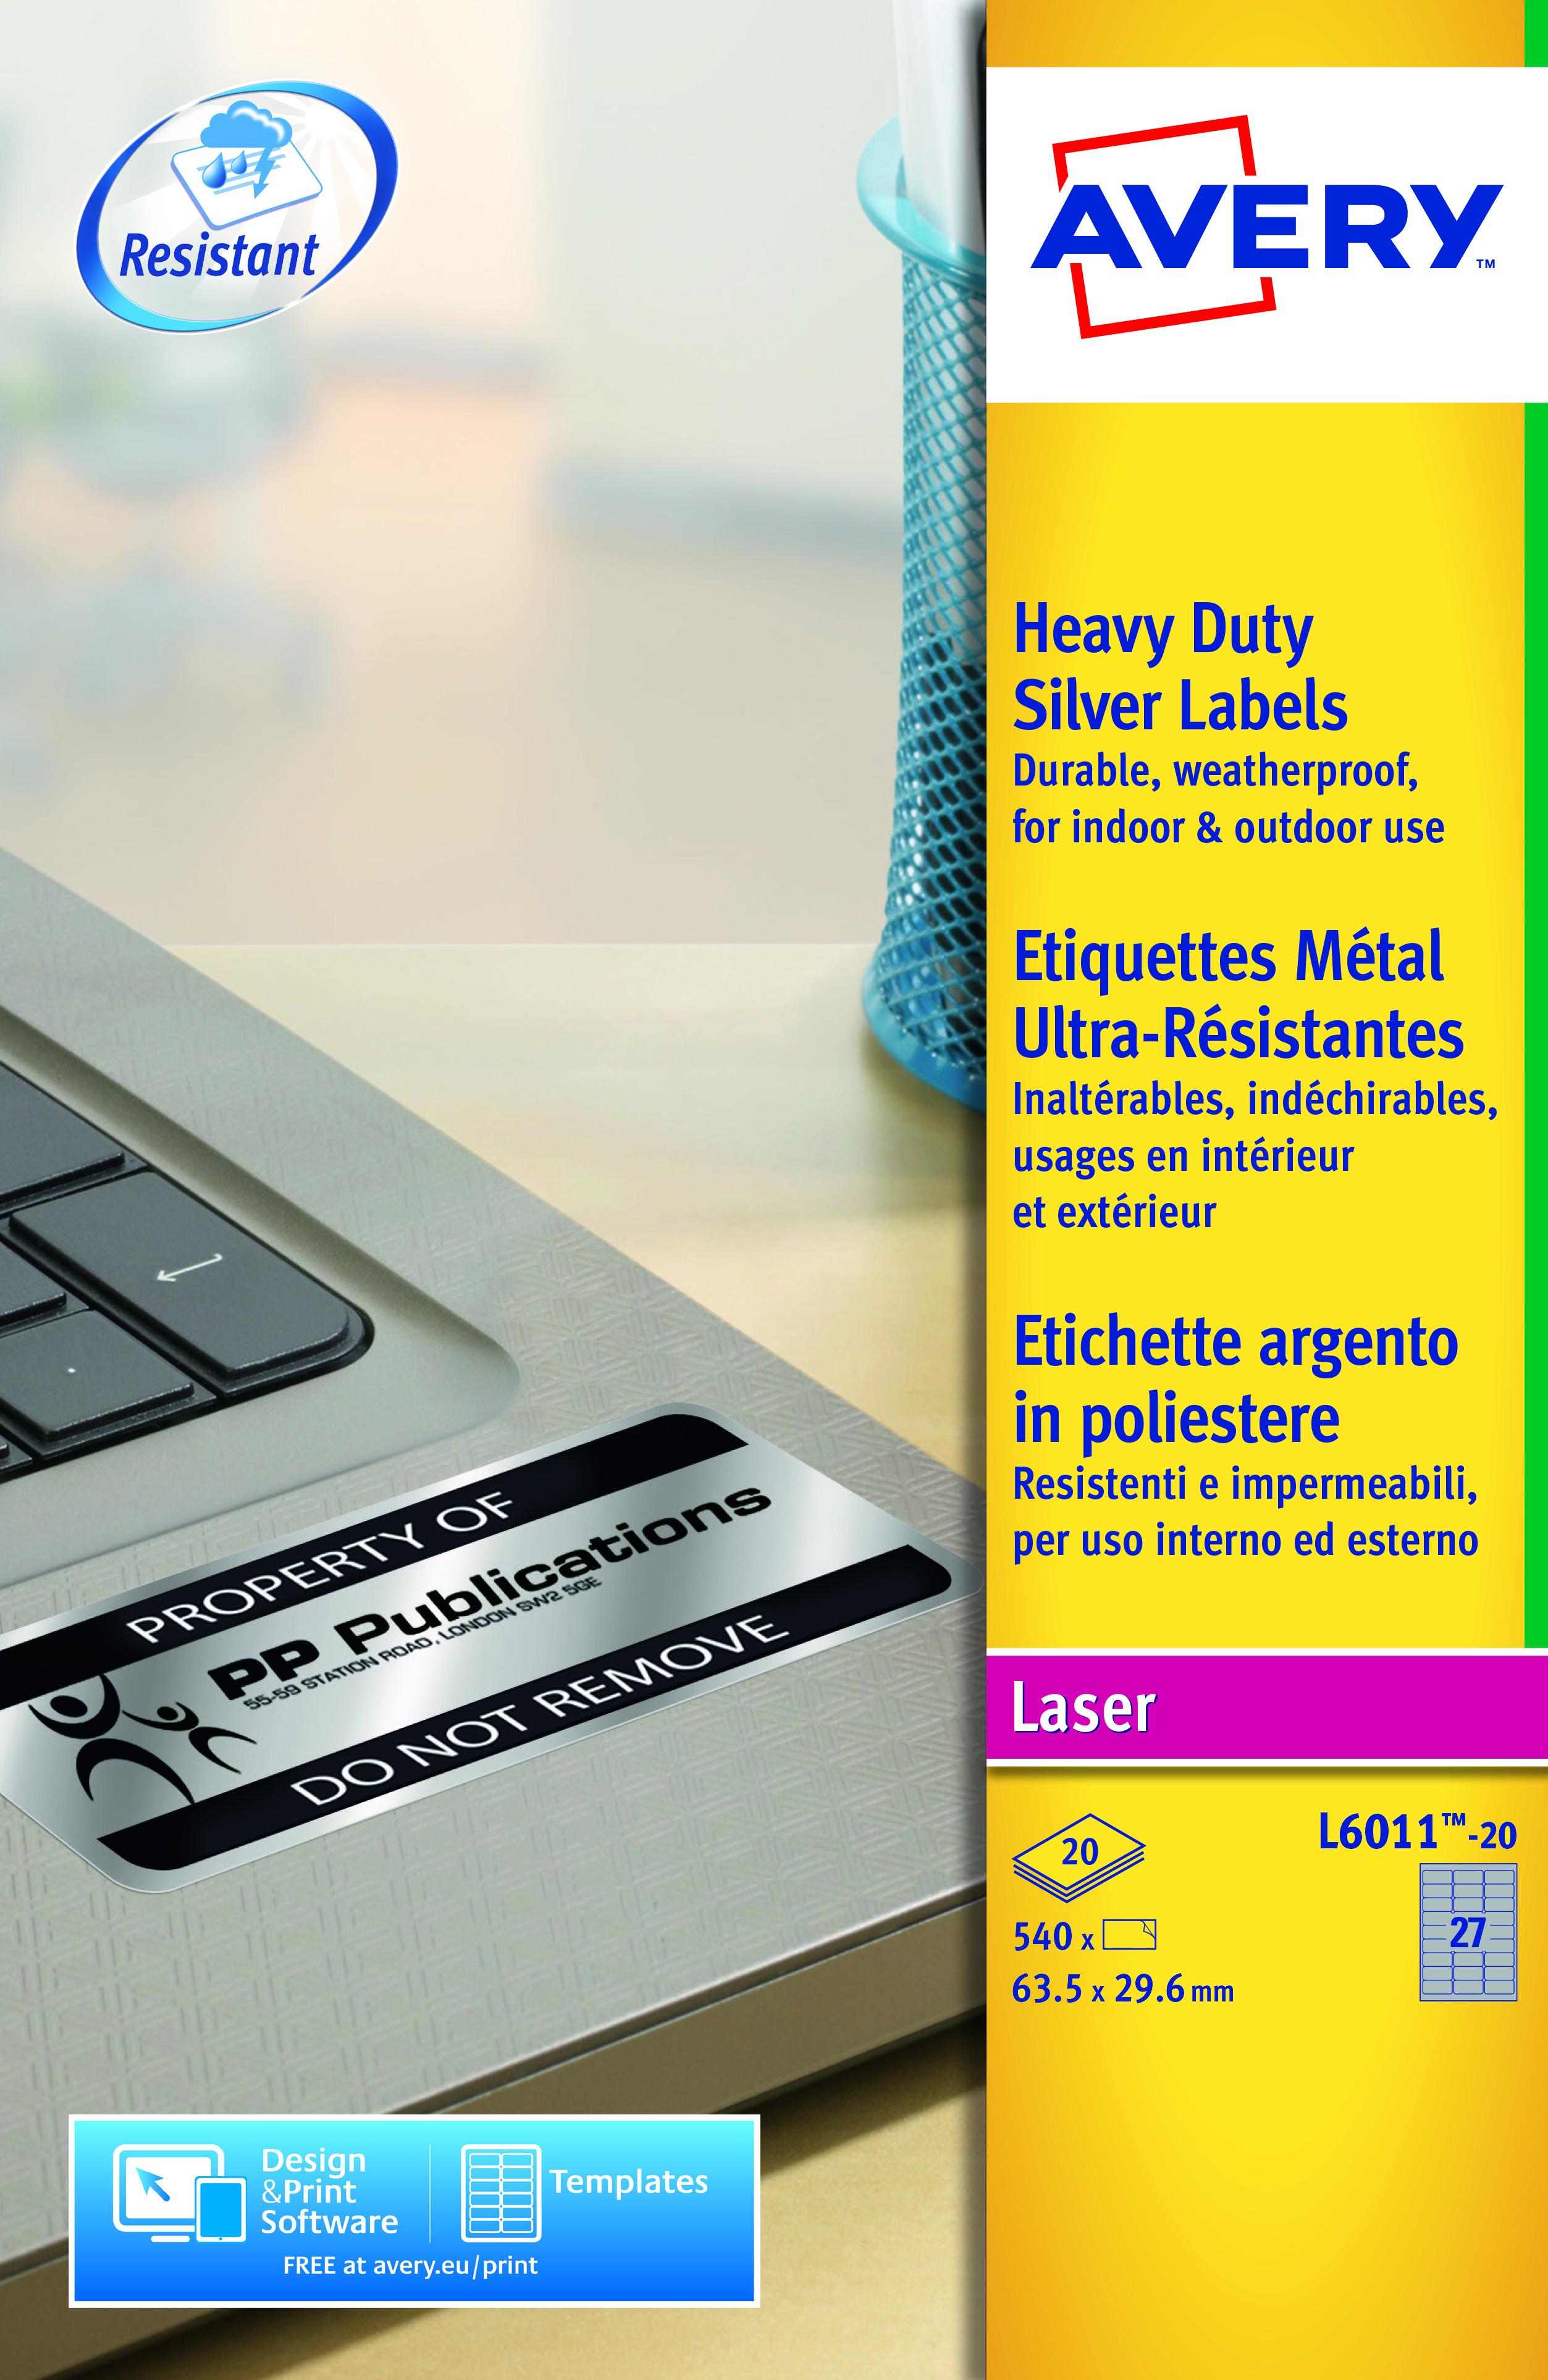 Avery HD Label 63.5x29.6mm SL PK540